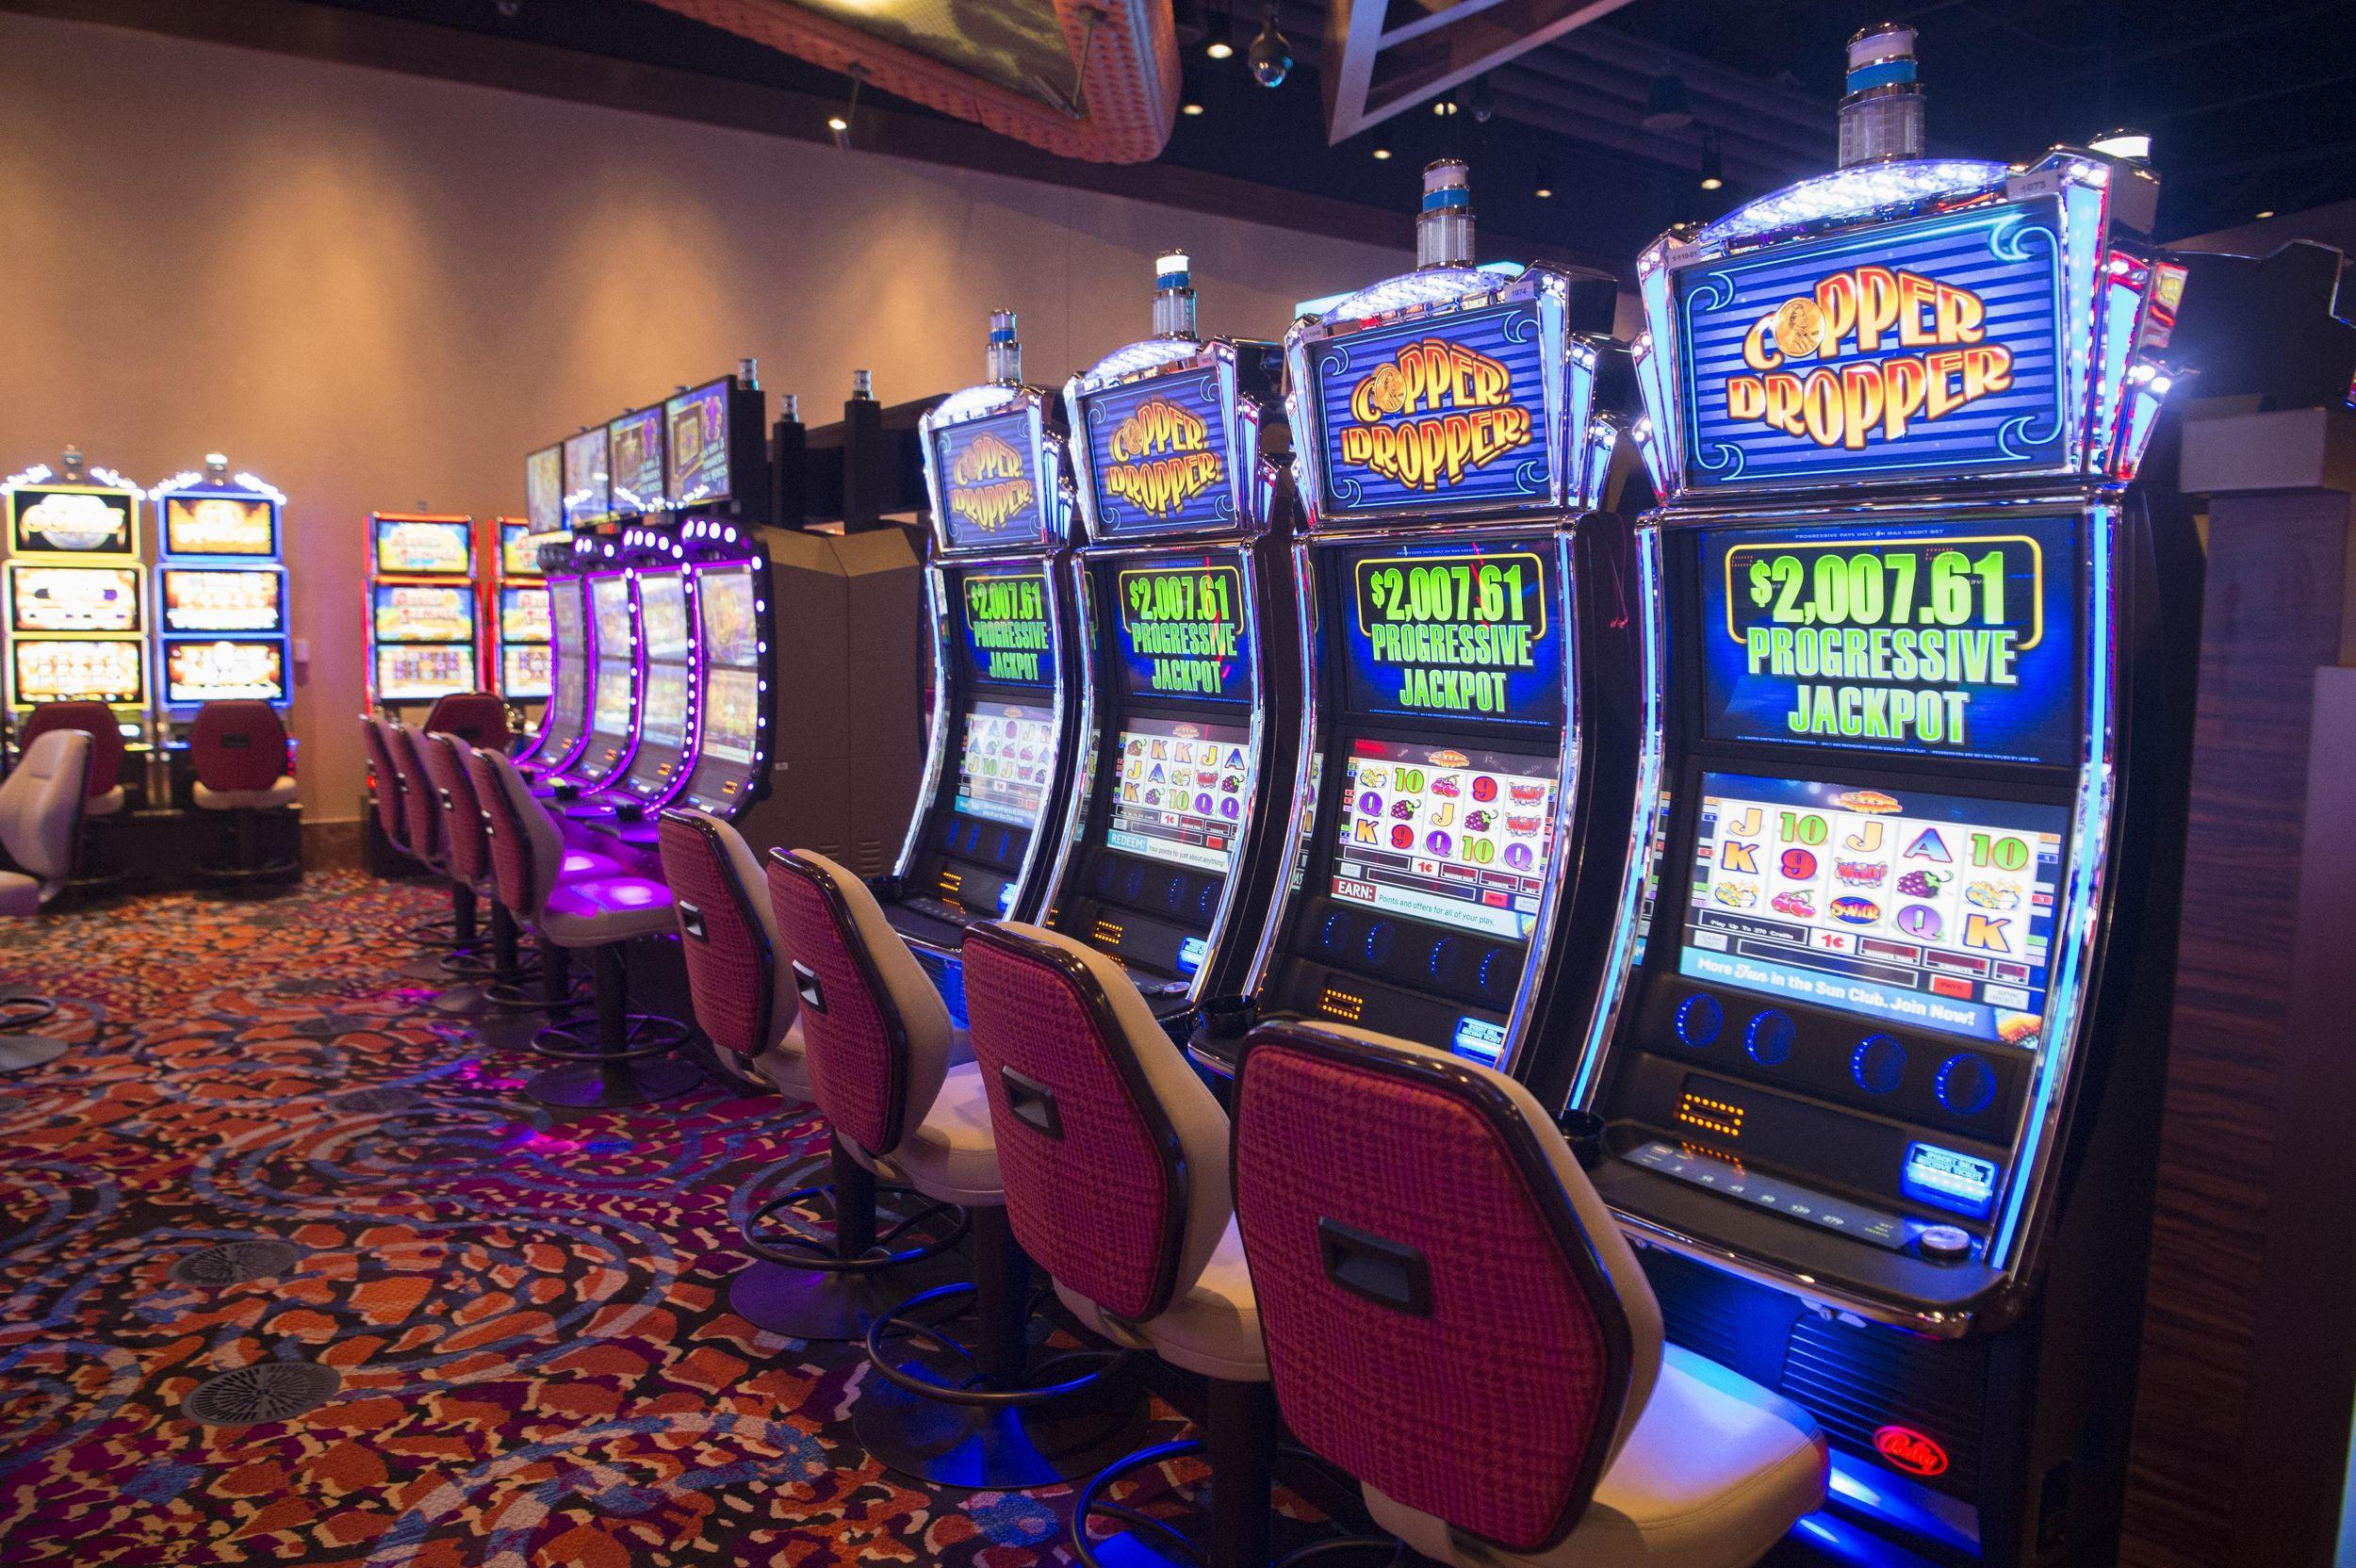 Spokane Tribe Betting On New Casino That Opens Monday The Spokesman Review